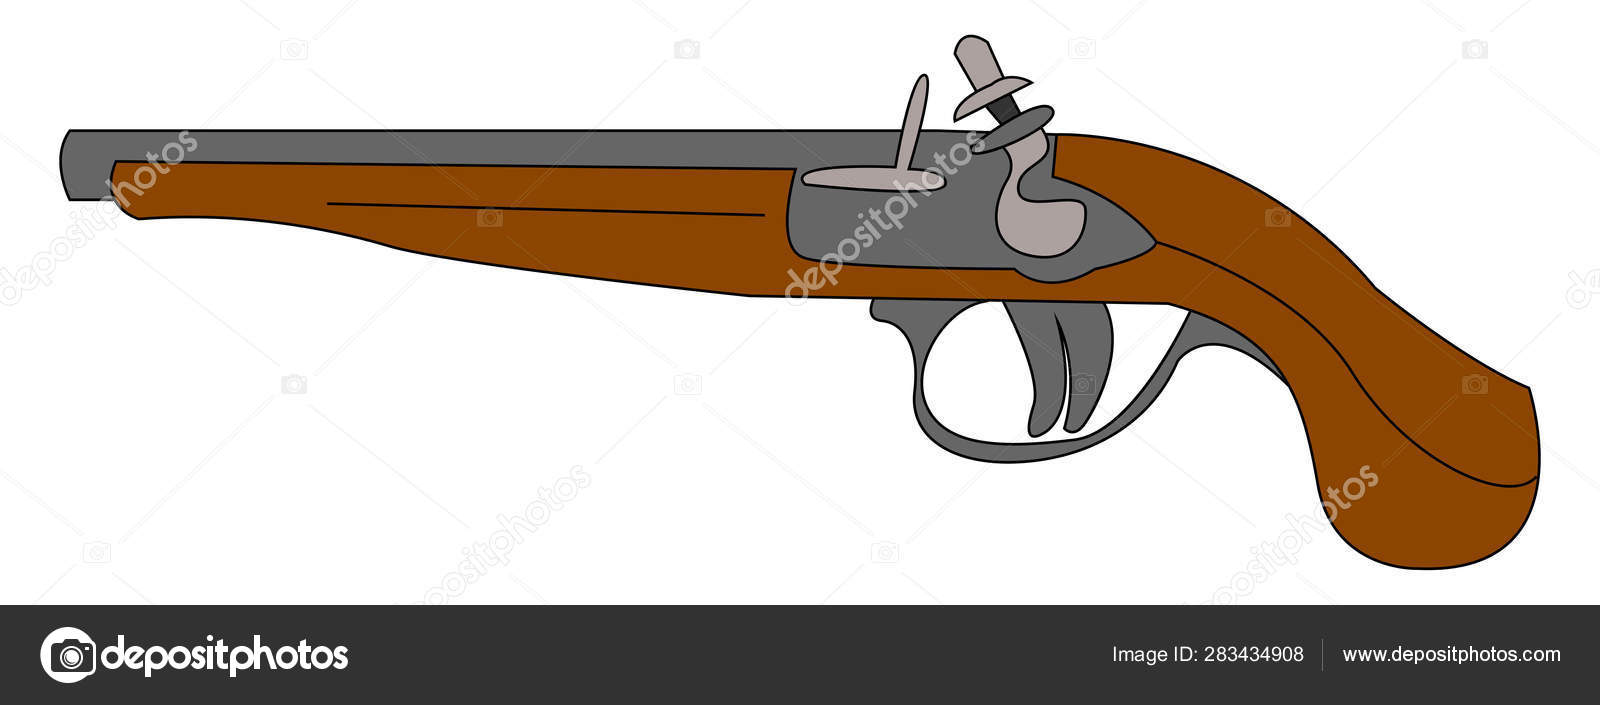 Musket old gun, illustration, vector on white background